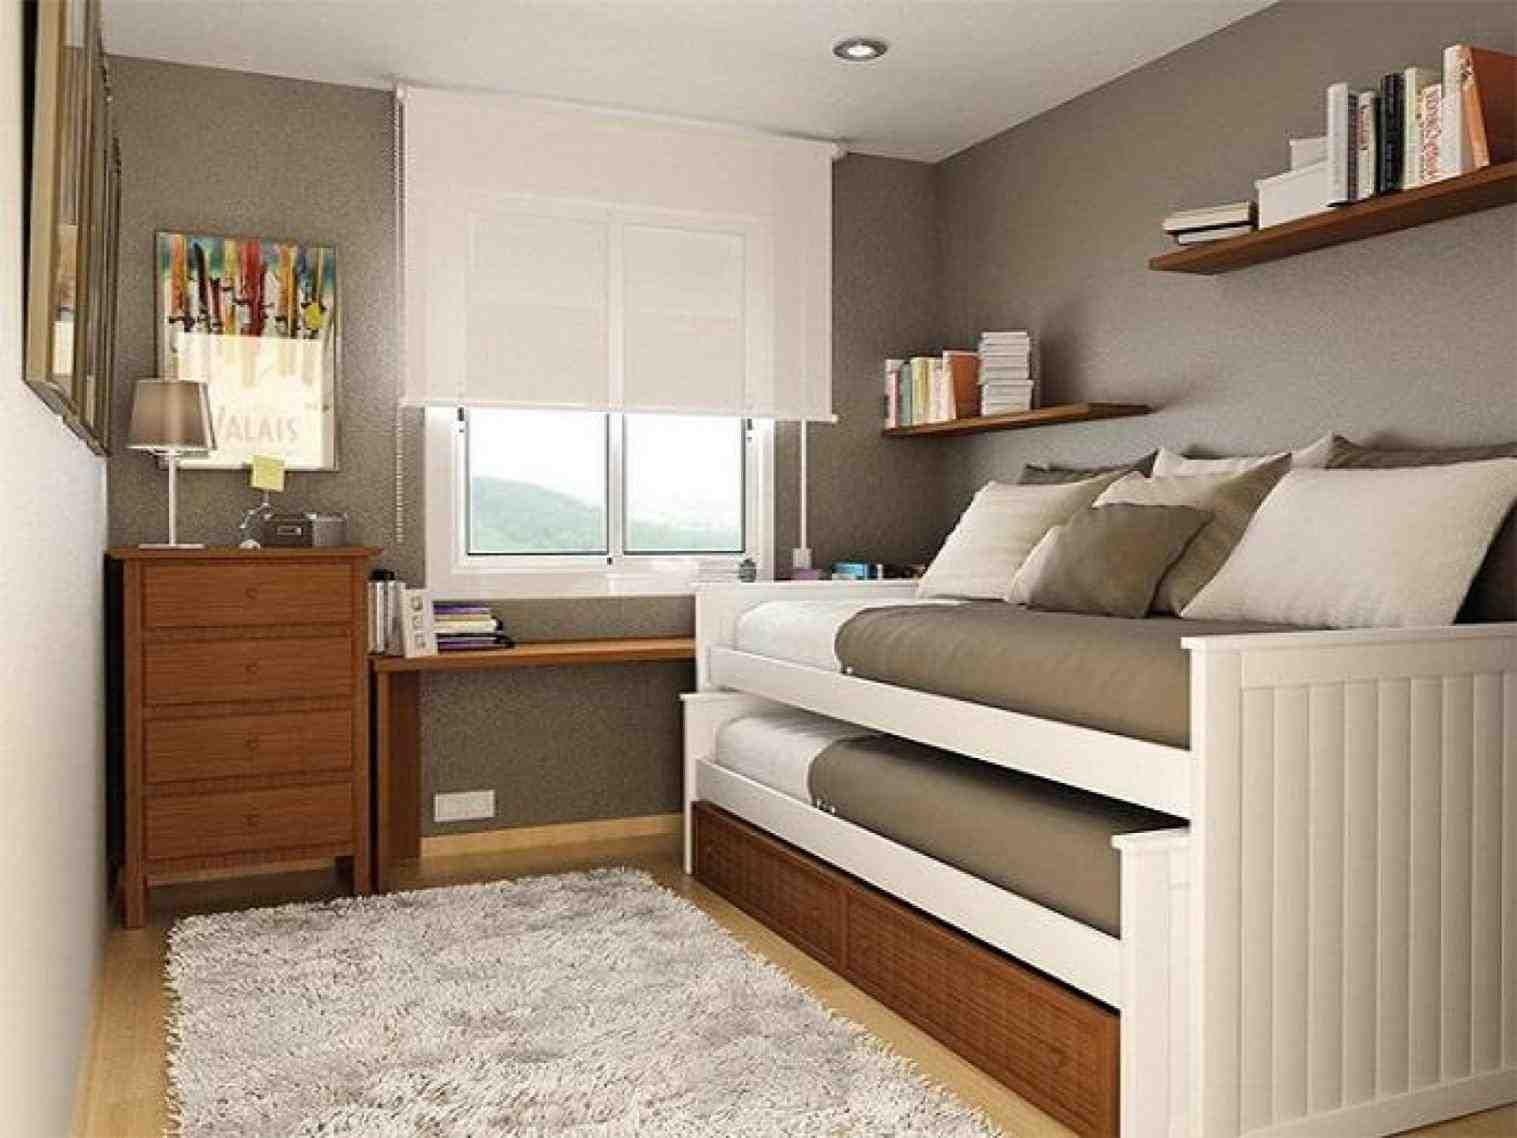 floorspace very small bedrooms for kids rooms bedroom ...